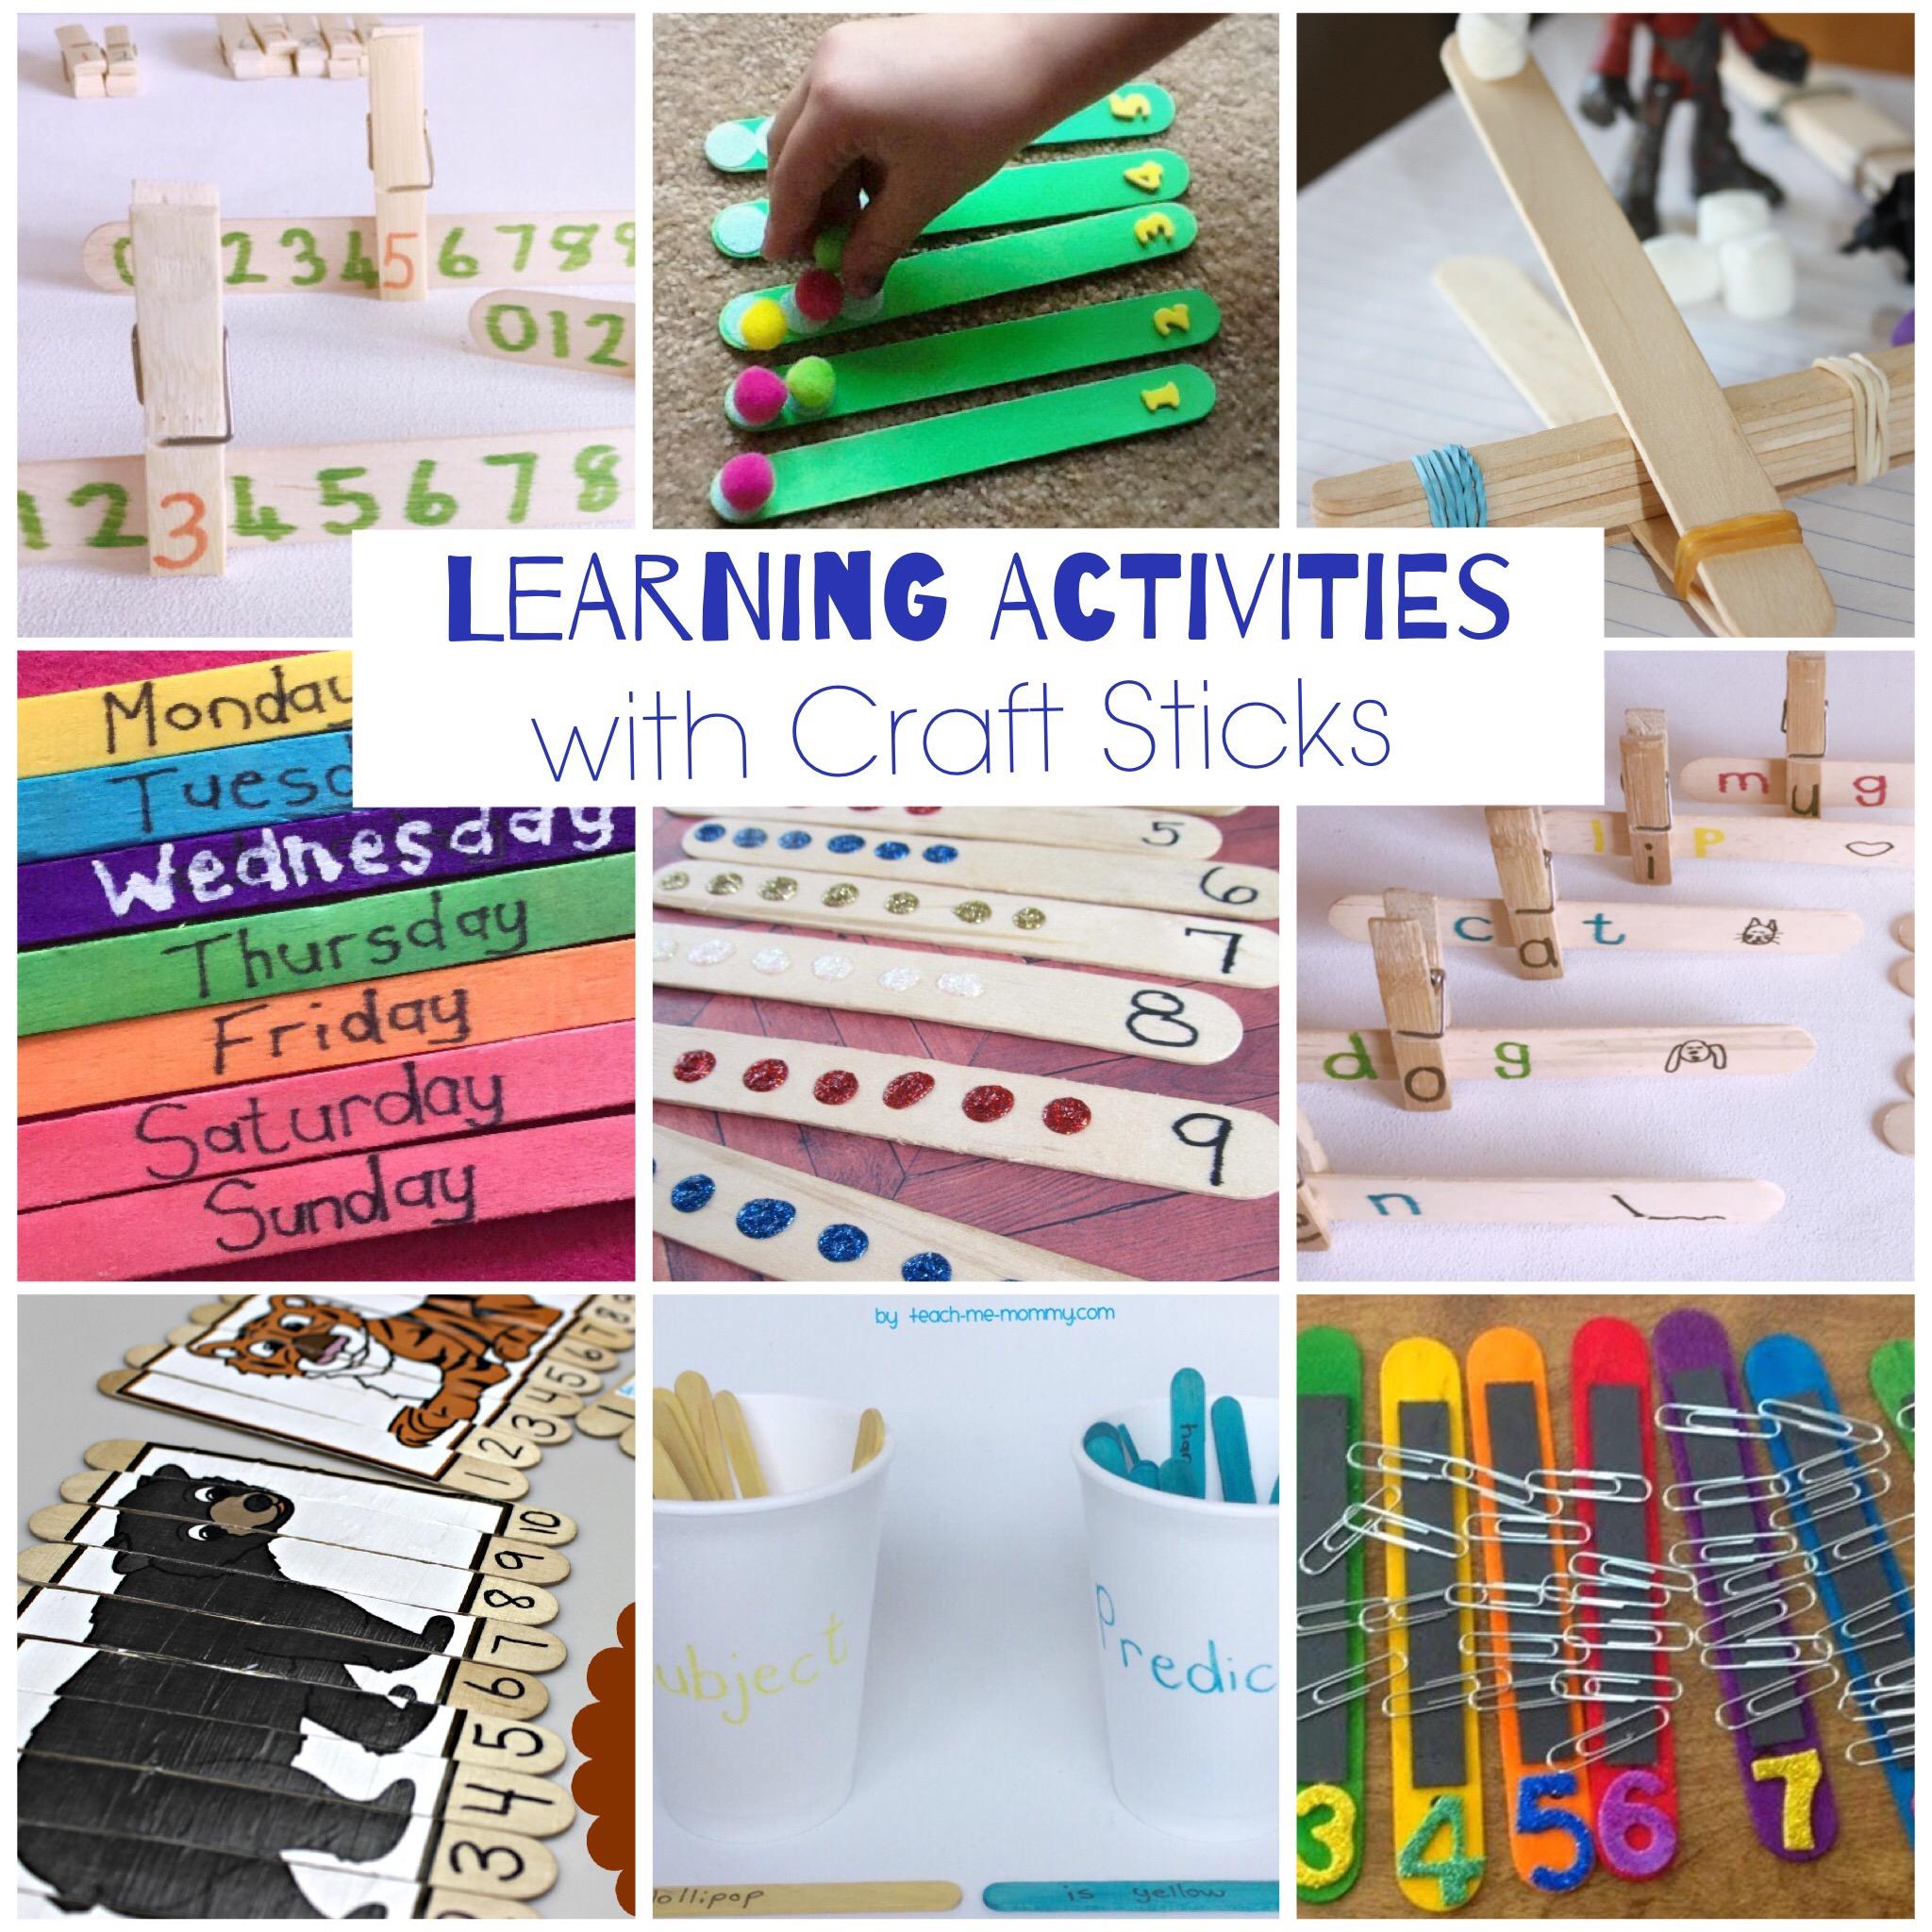 Craft sticks Activities